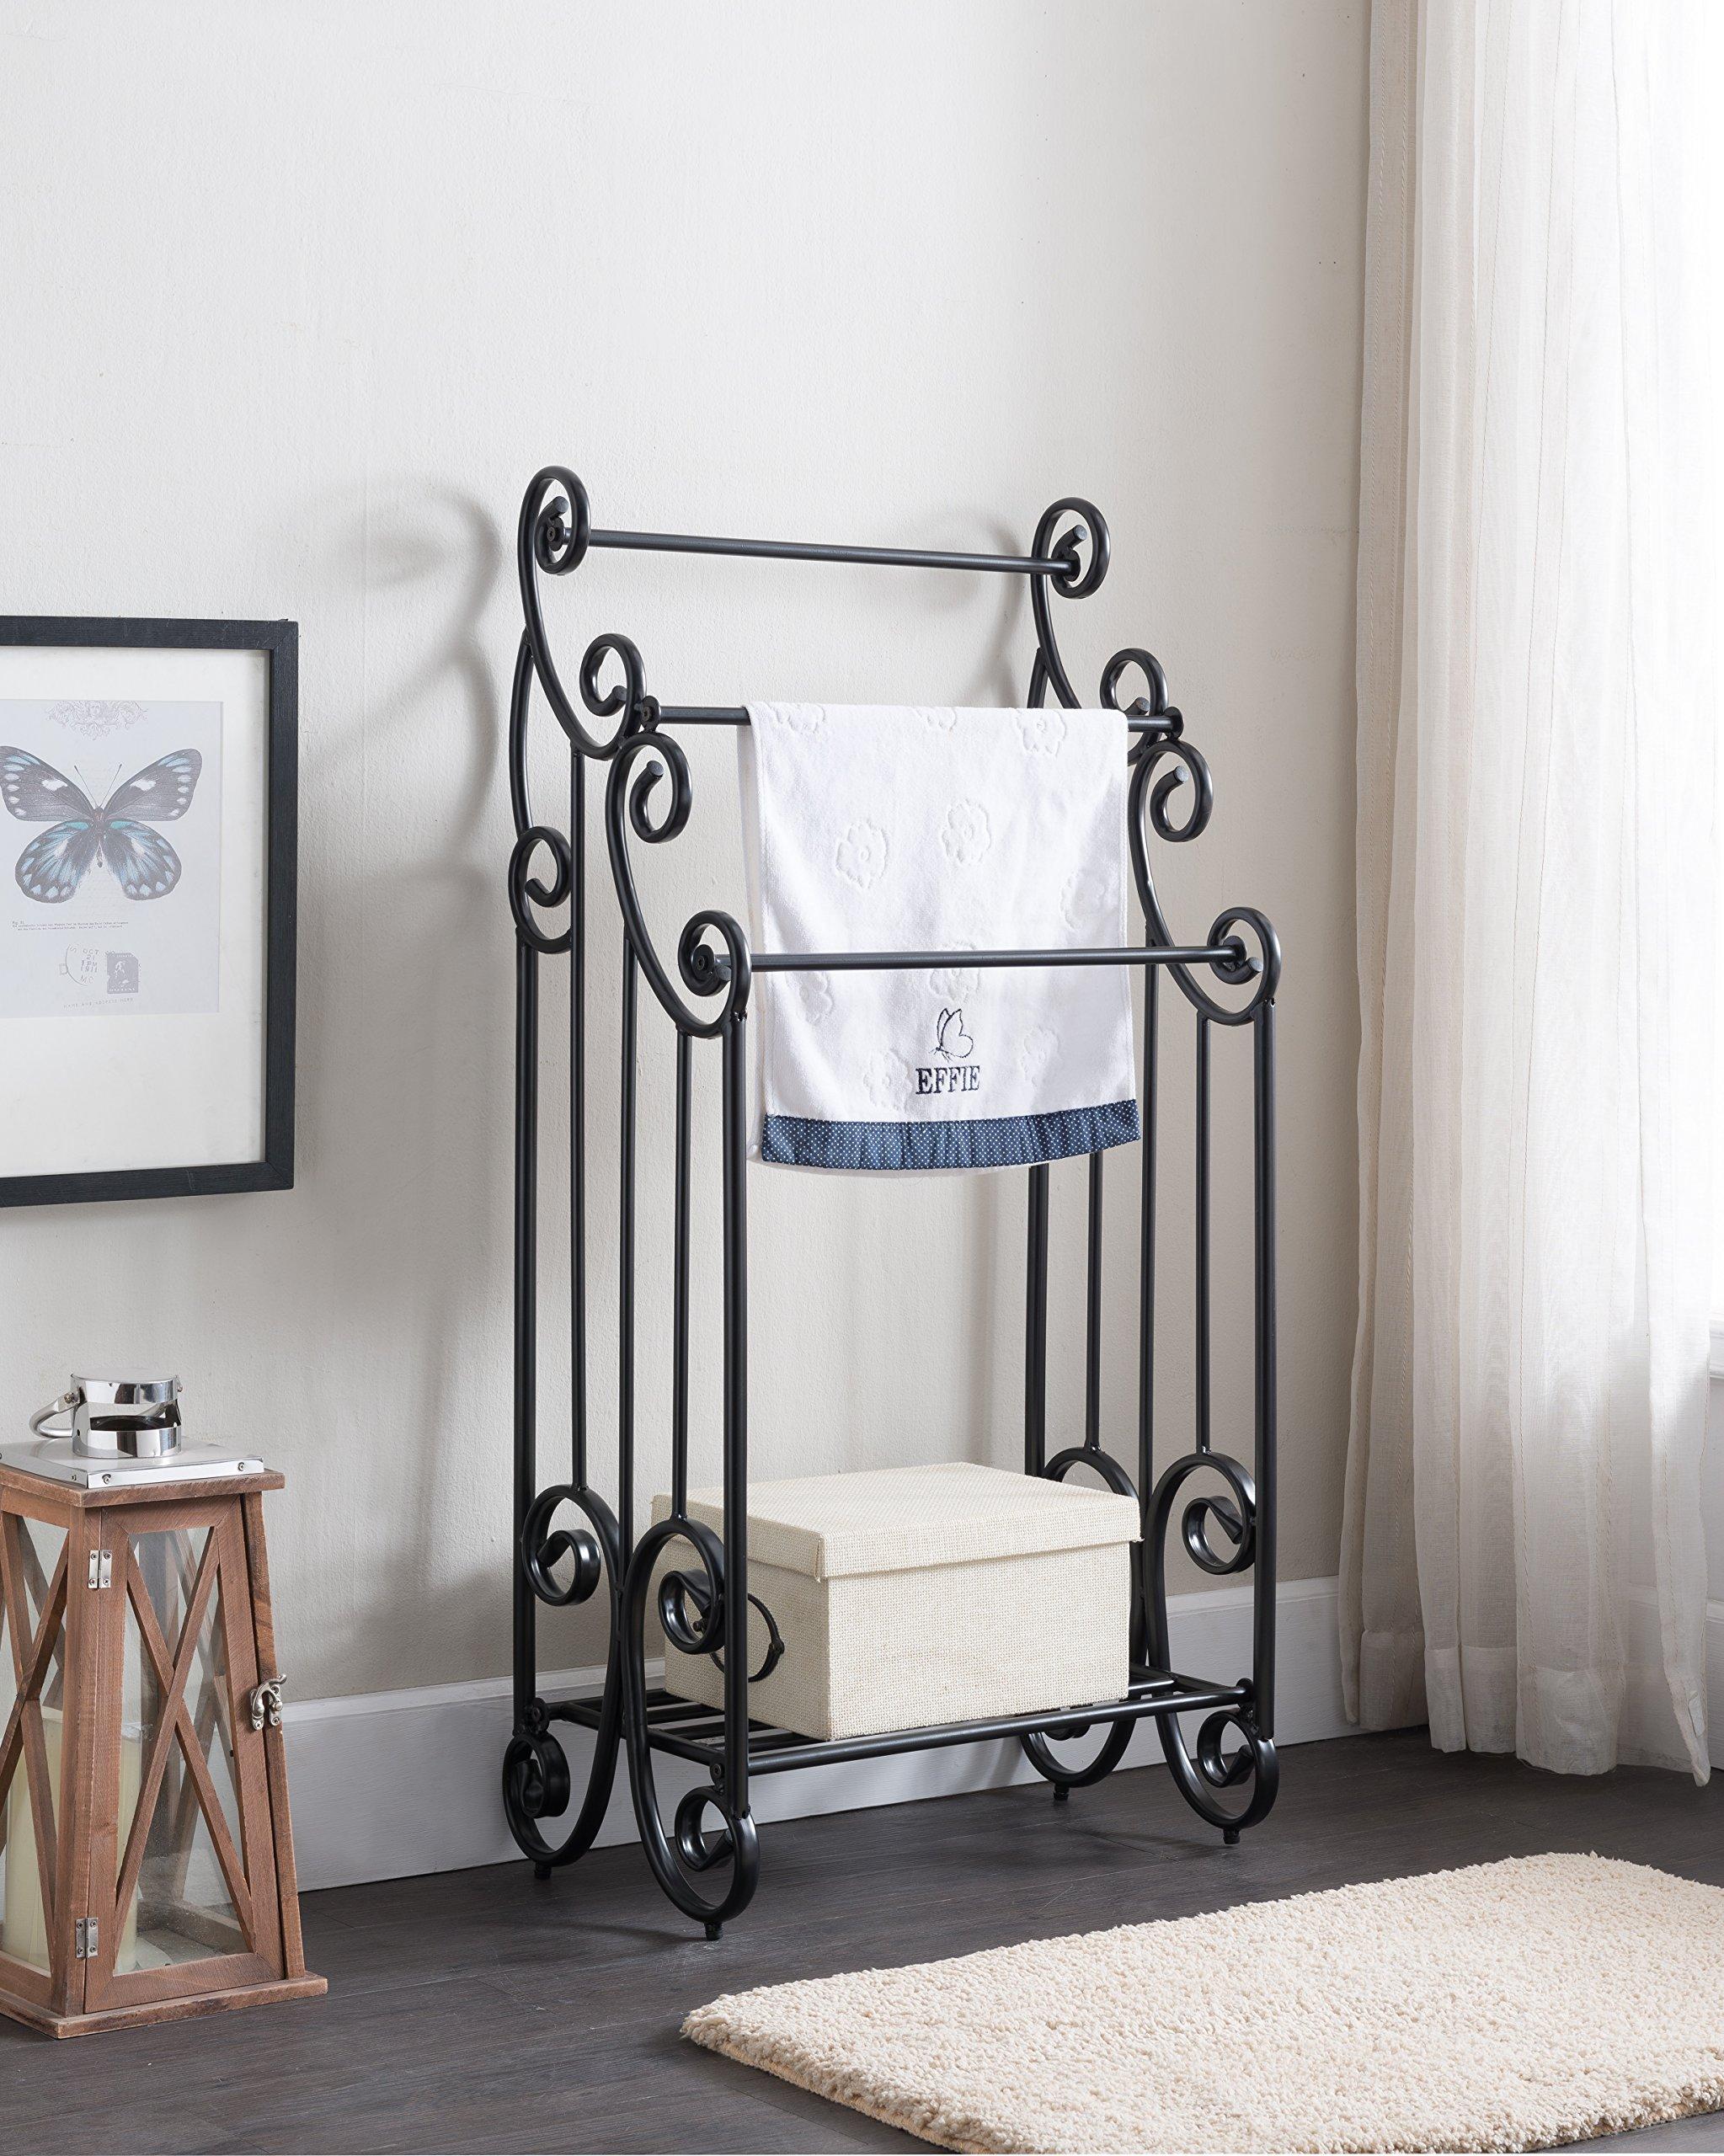 Black Metal Finish Large Towel Rack Bathroom Stand Shelf Three Bars with Bottom Storage and Scroll Design